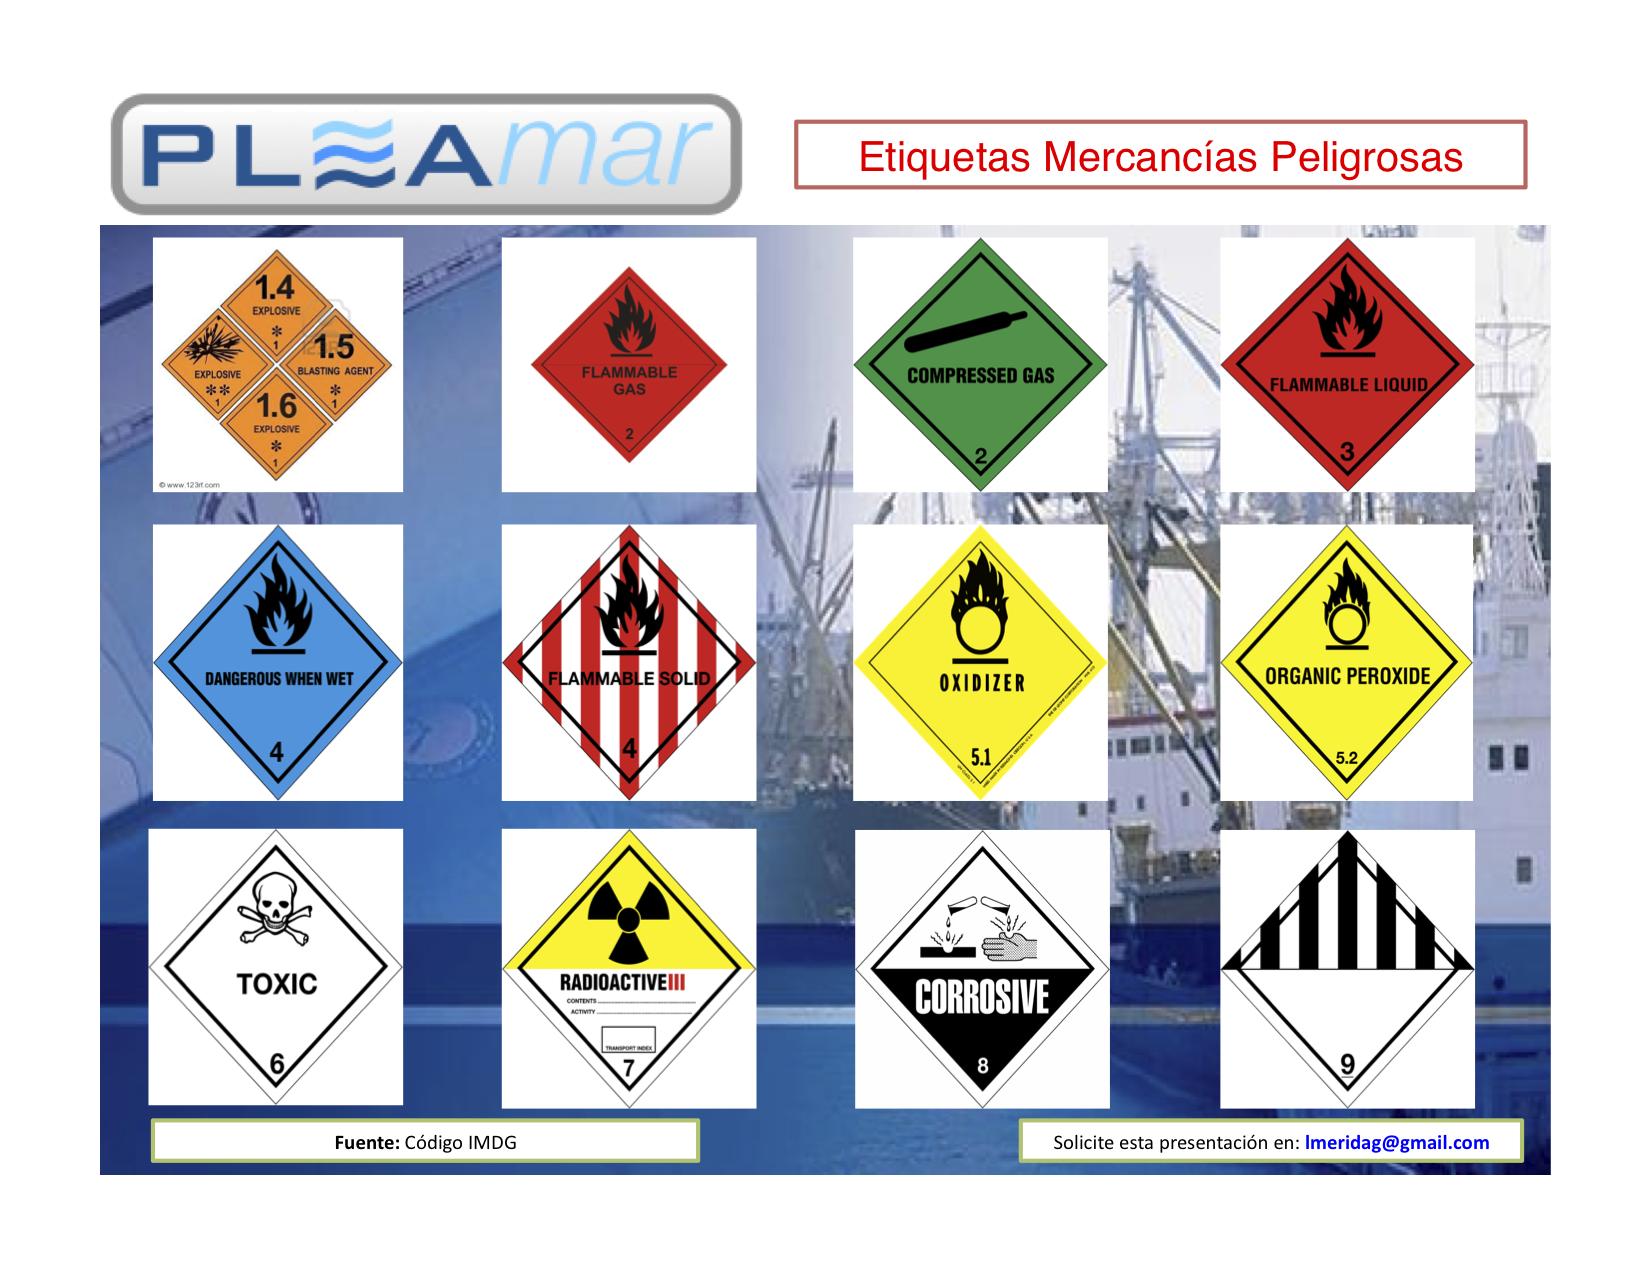 Etiquetas mercancias peligrosas